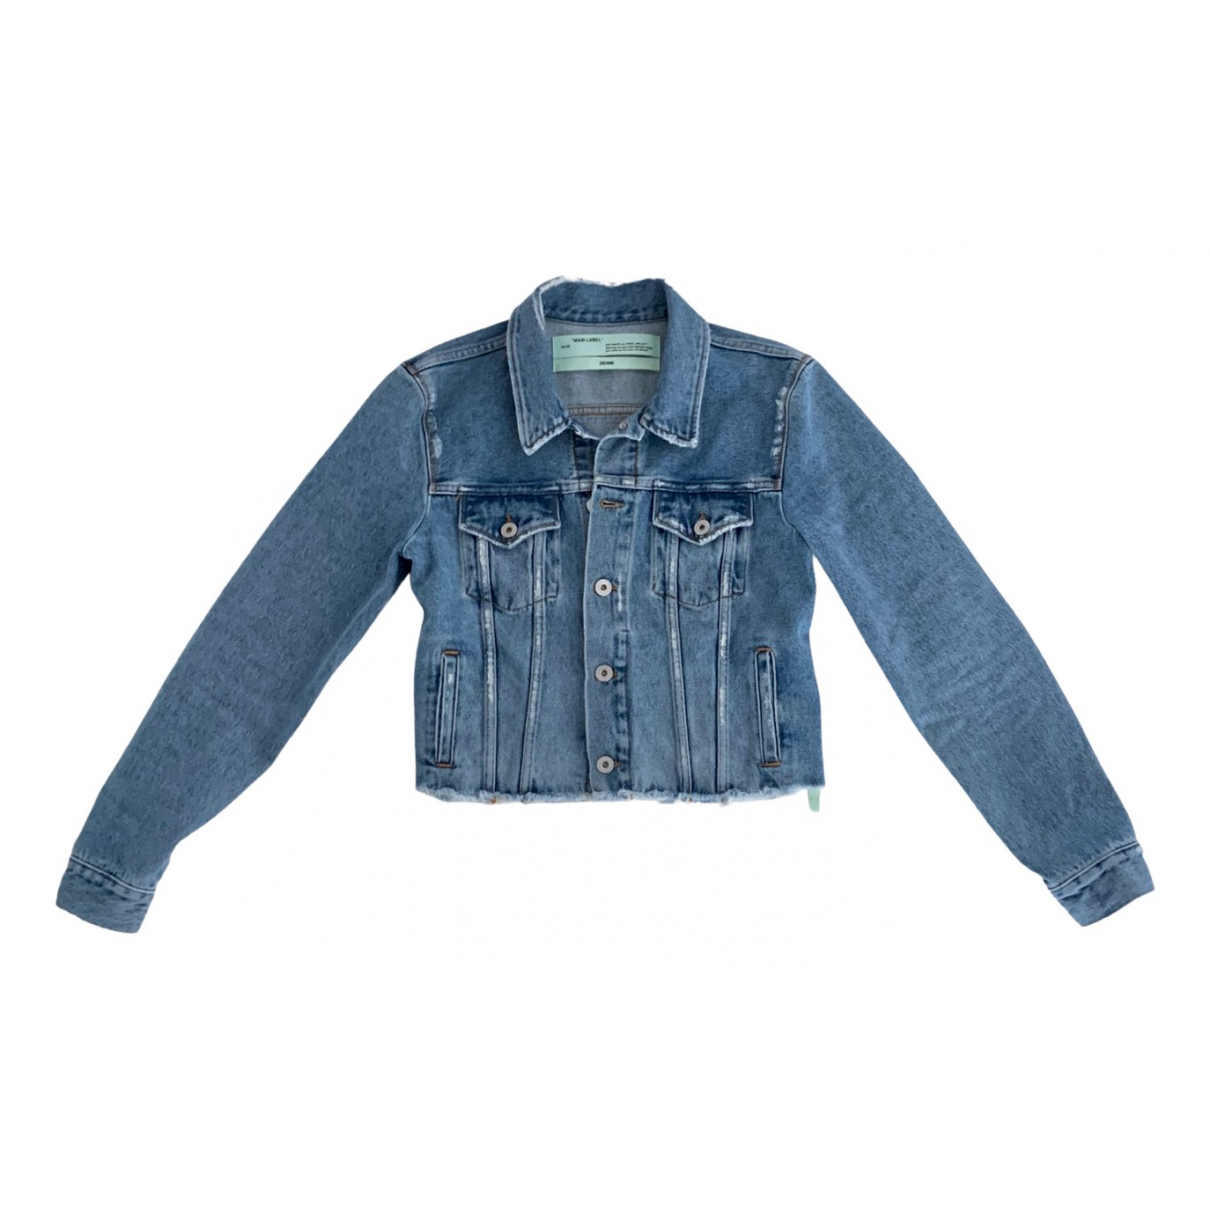 Off-white \N Blue Denim - Jeans jacket for Women 42 IT